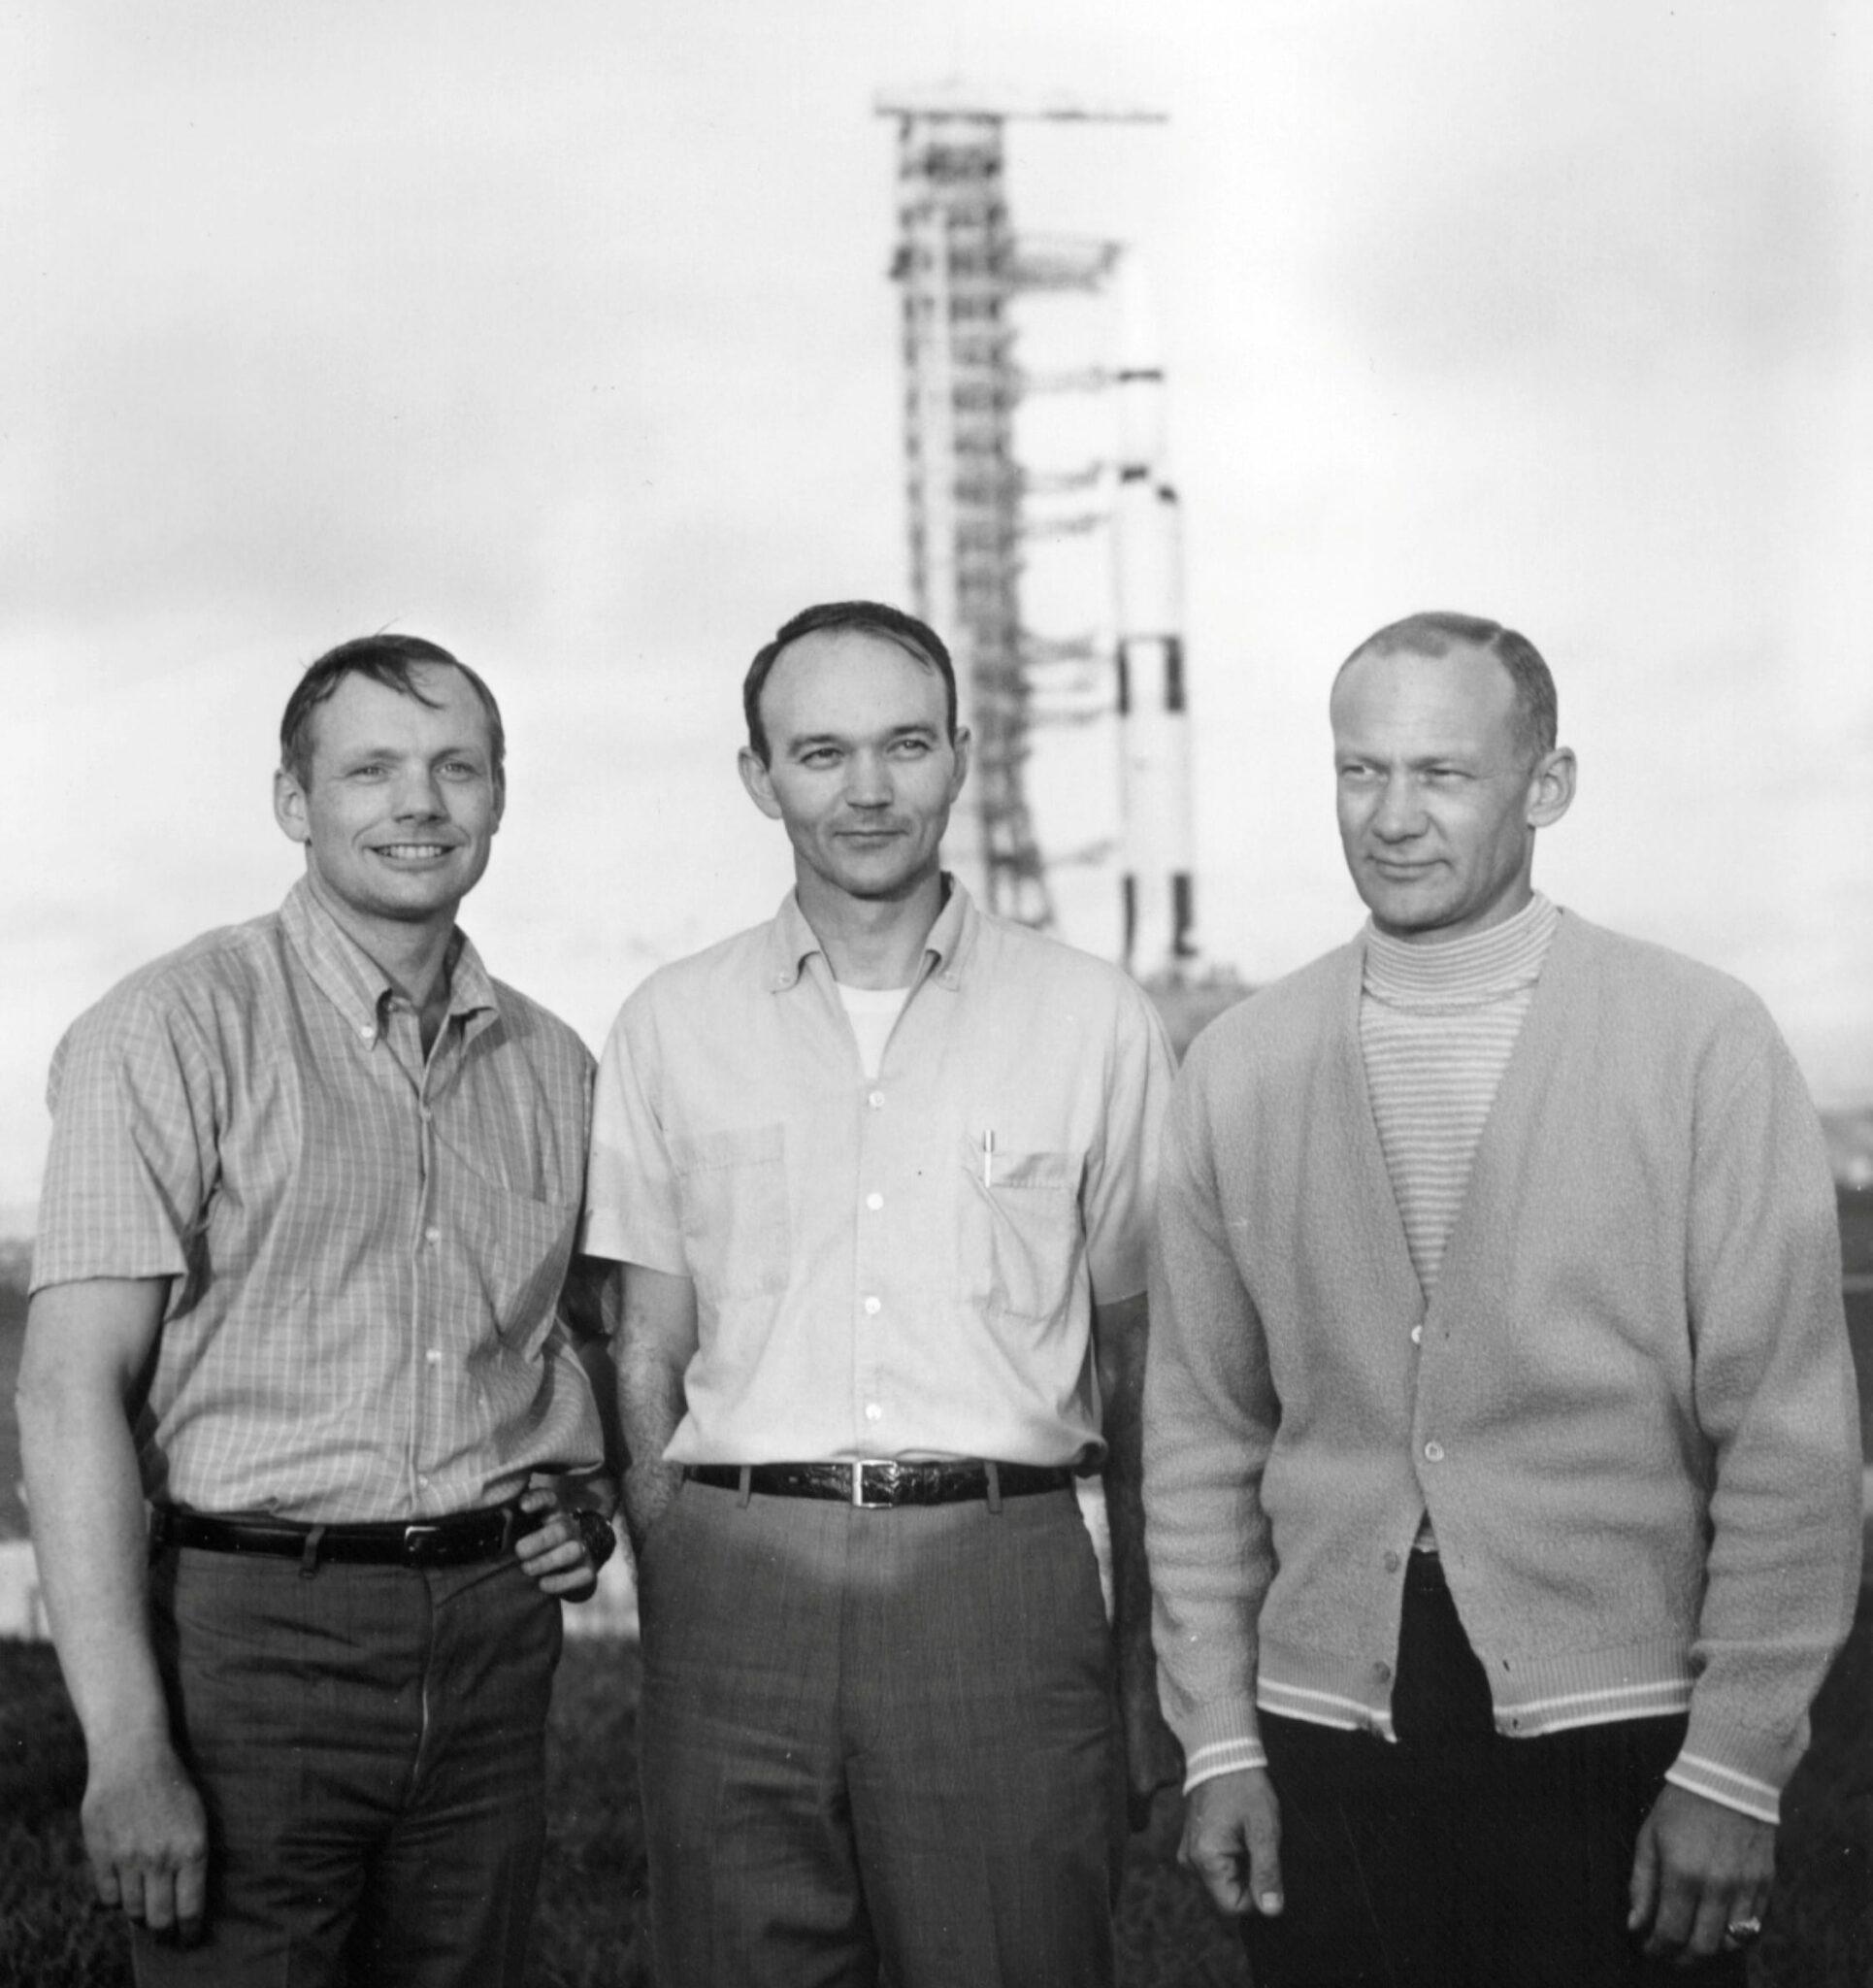 Neil Armstrong, Michael Collins a Buzz Aldrin před raketou Saturn V